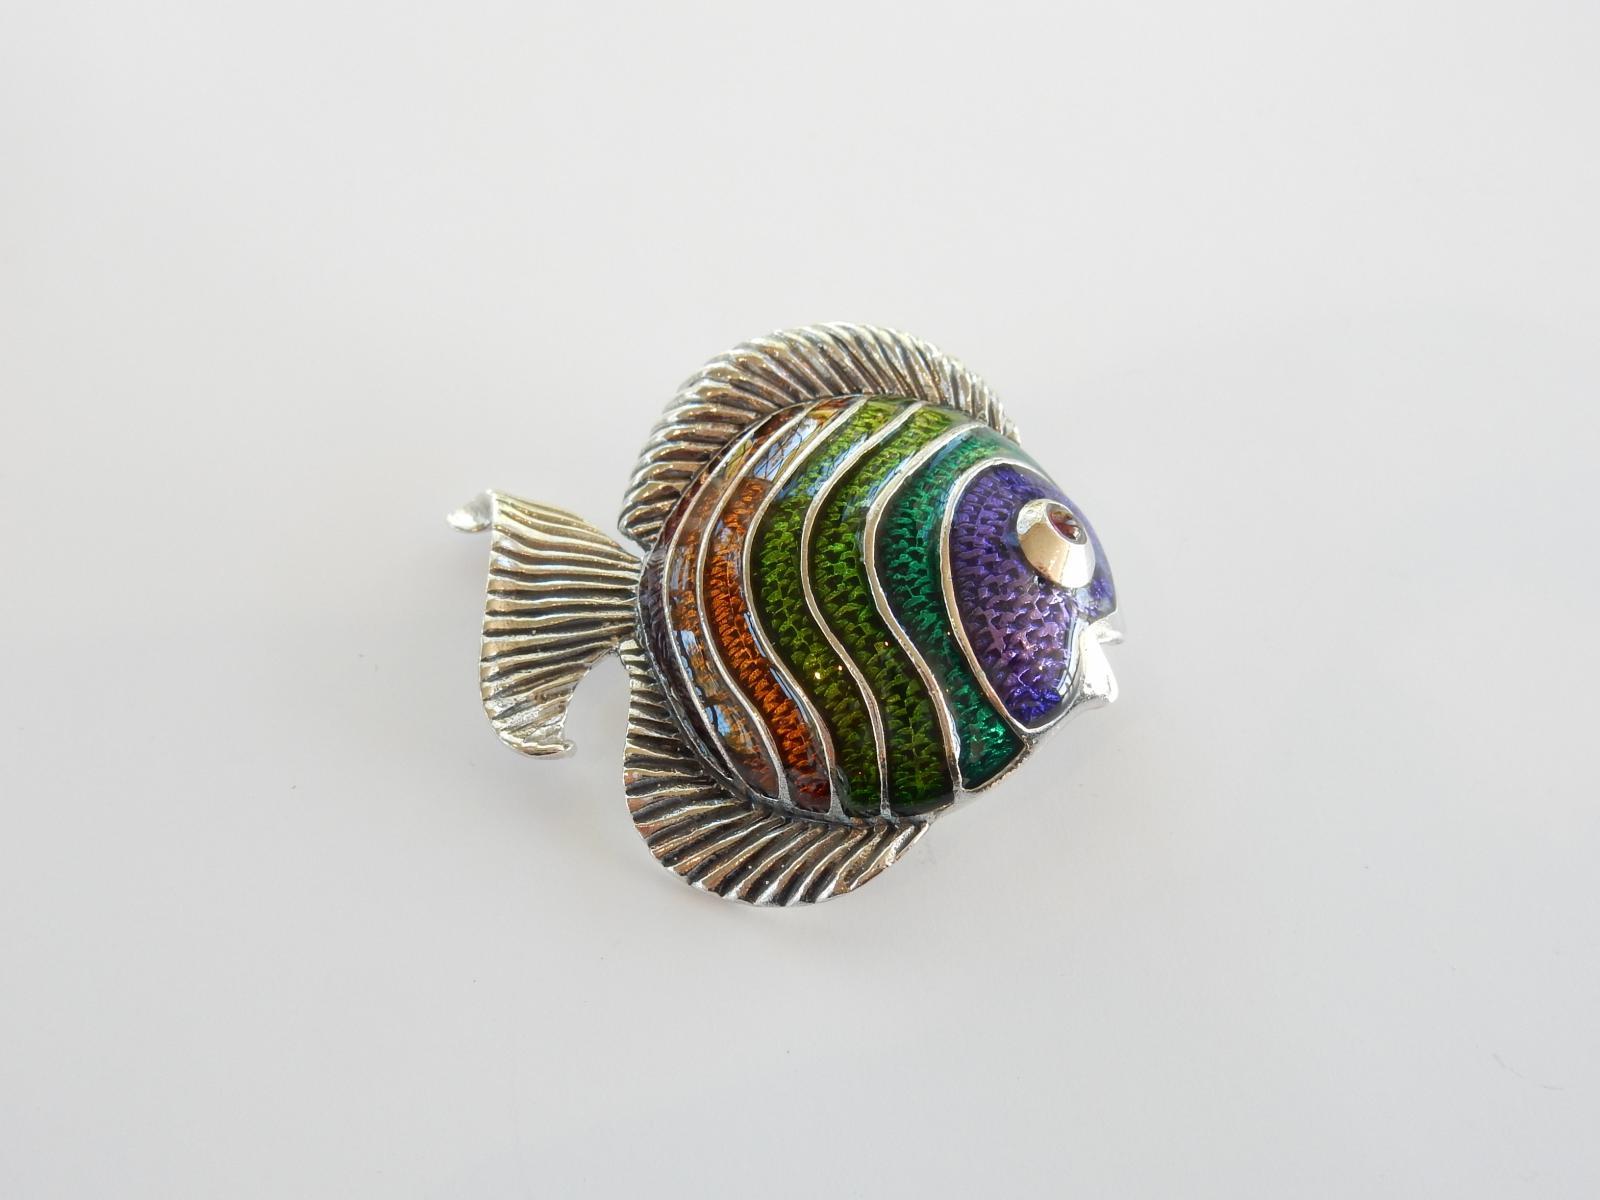 Photo of Silver & Enamel Tropical Fish Brooch